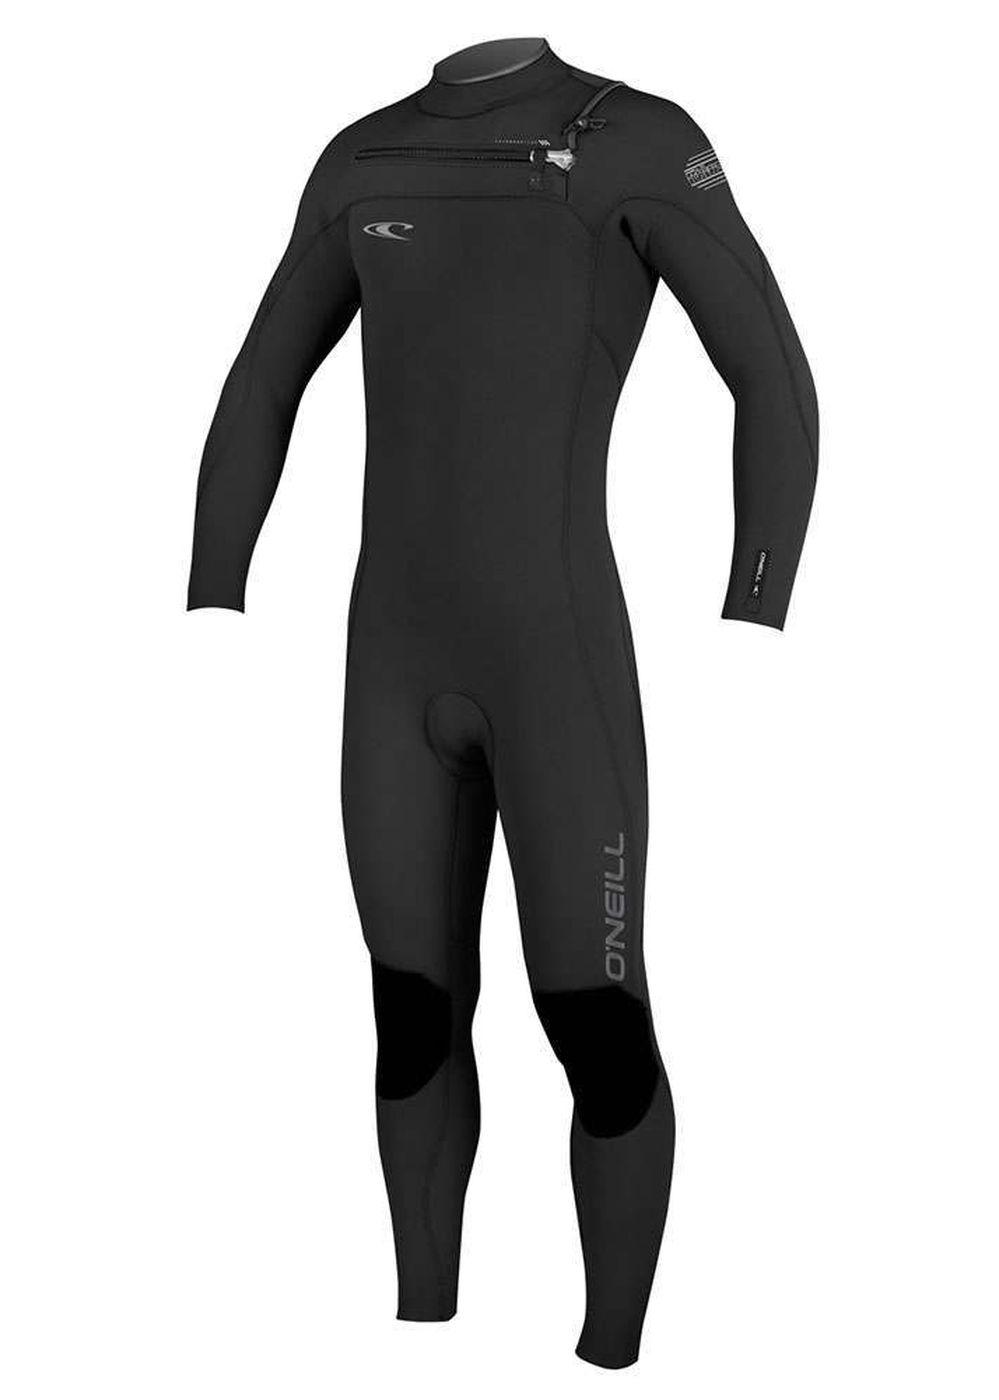 Oneill Hyperfreak 3/2 Gbs Wetsuit 2017 Blk/grph Picture